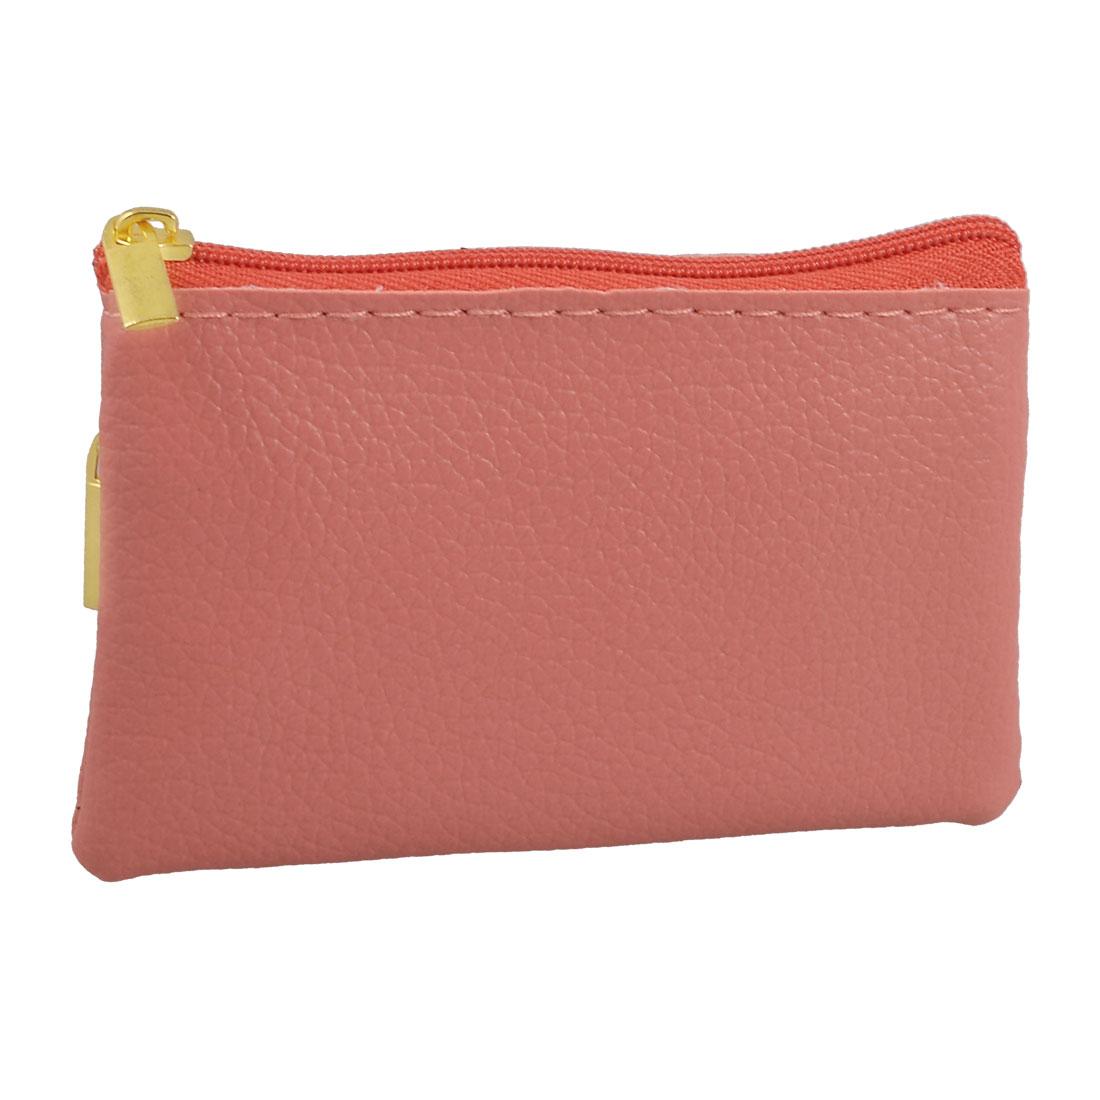 Pink Faux Leather Mini Zipper Bag Key Card Coins Purse Change Wallet